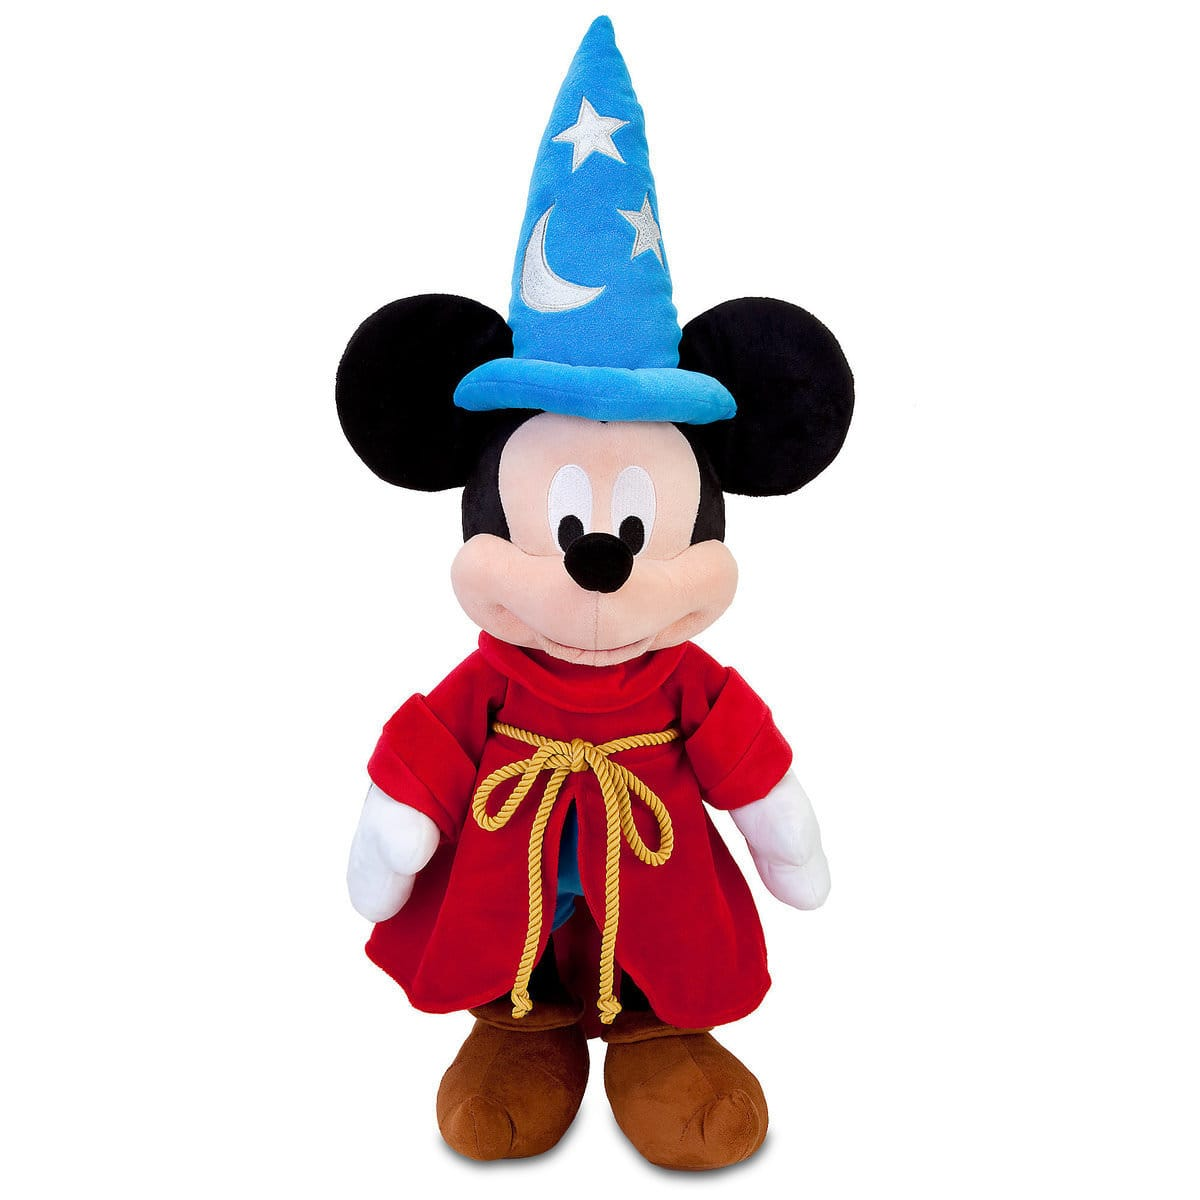 Disney Store Free Shipping No Minimum